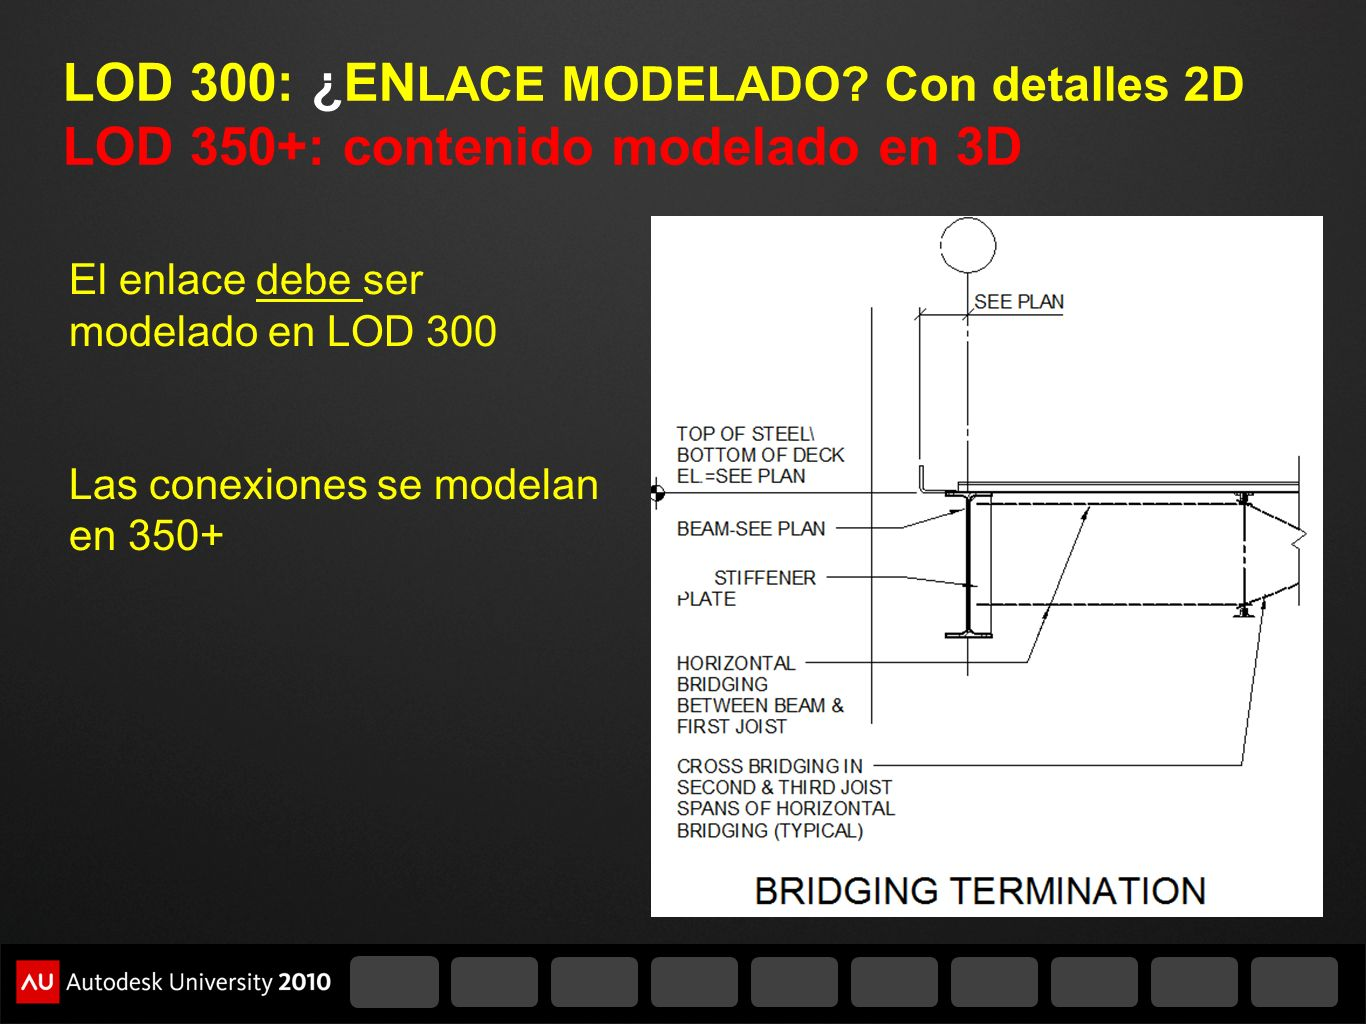 LOD 300: ¿ENLACE MODELADO Con detalles 2D LOD 350+: contenido modelado en 3D